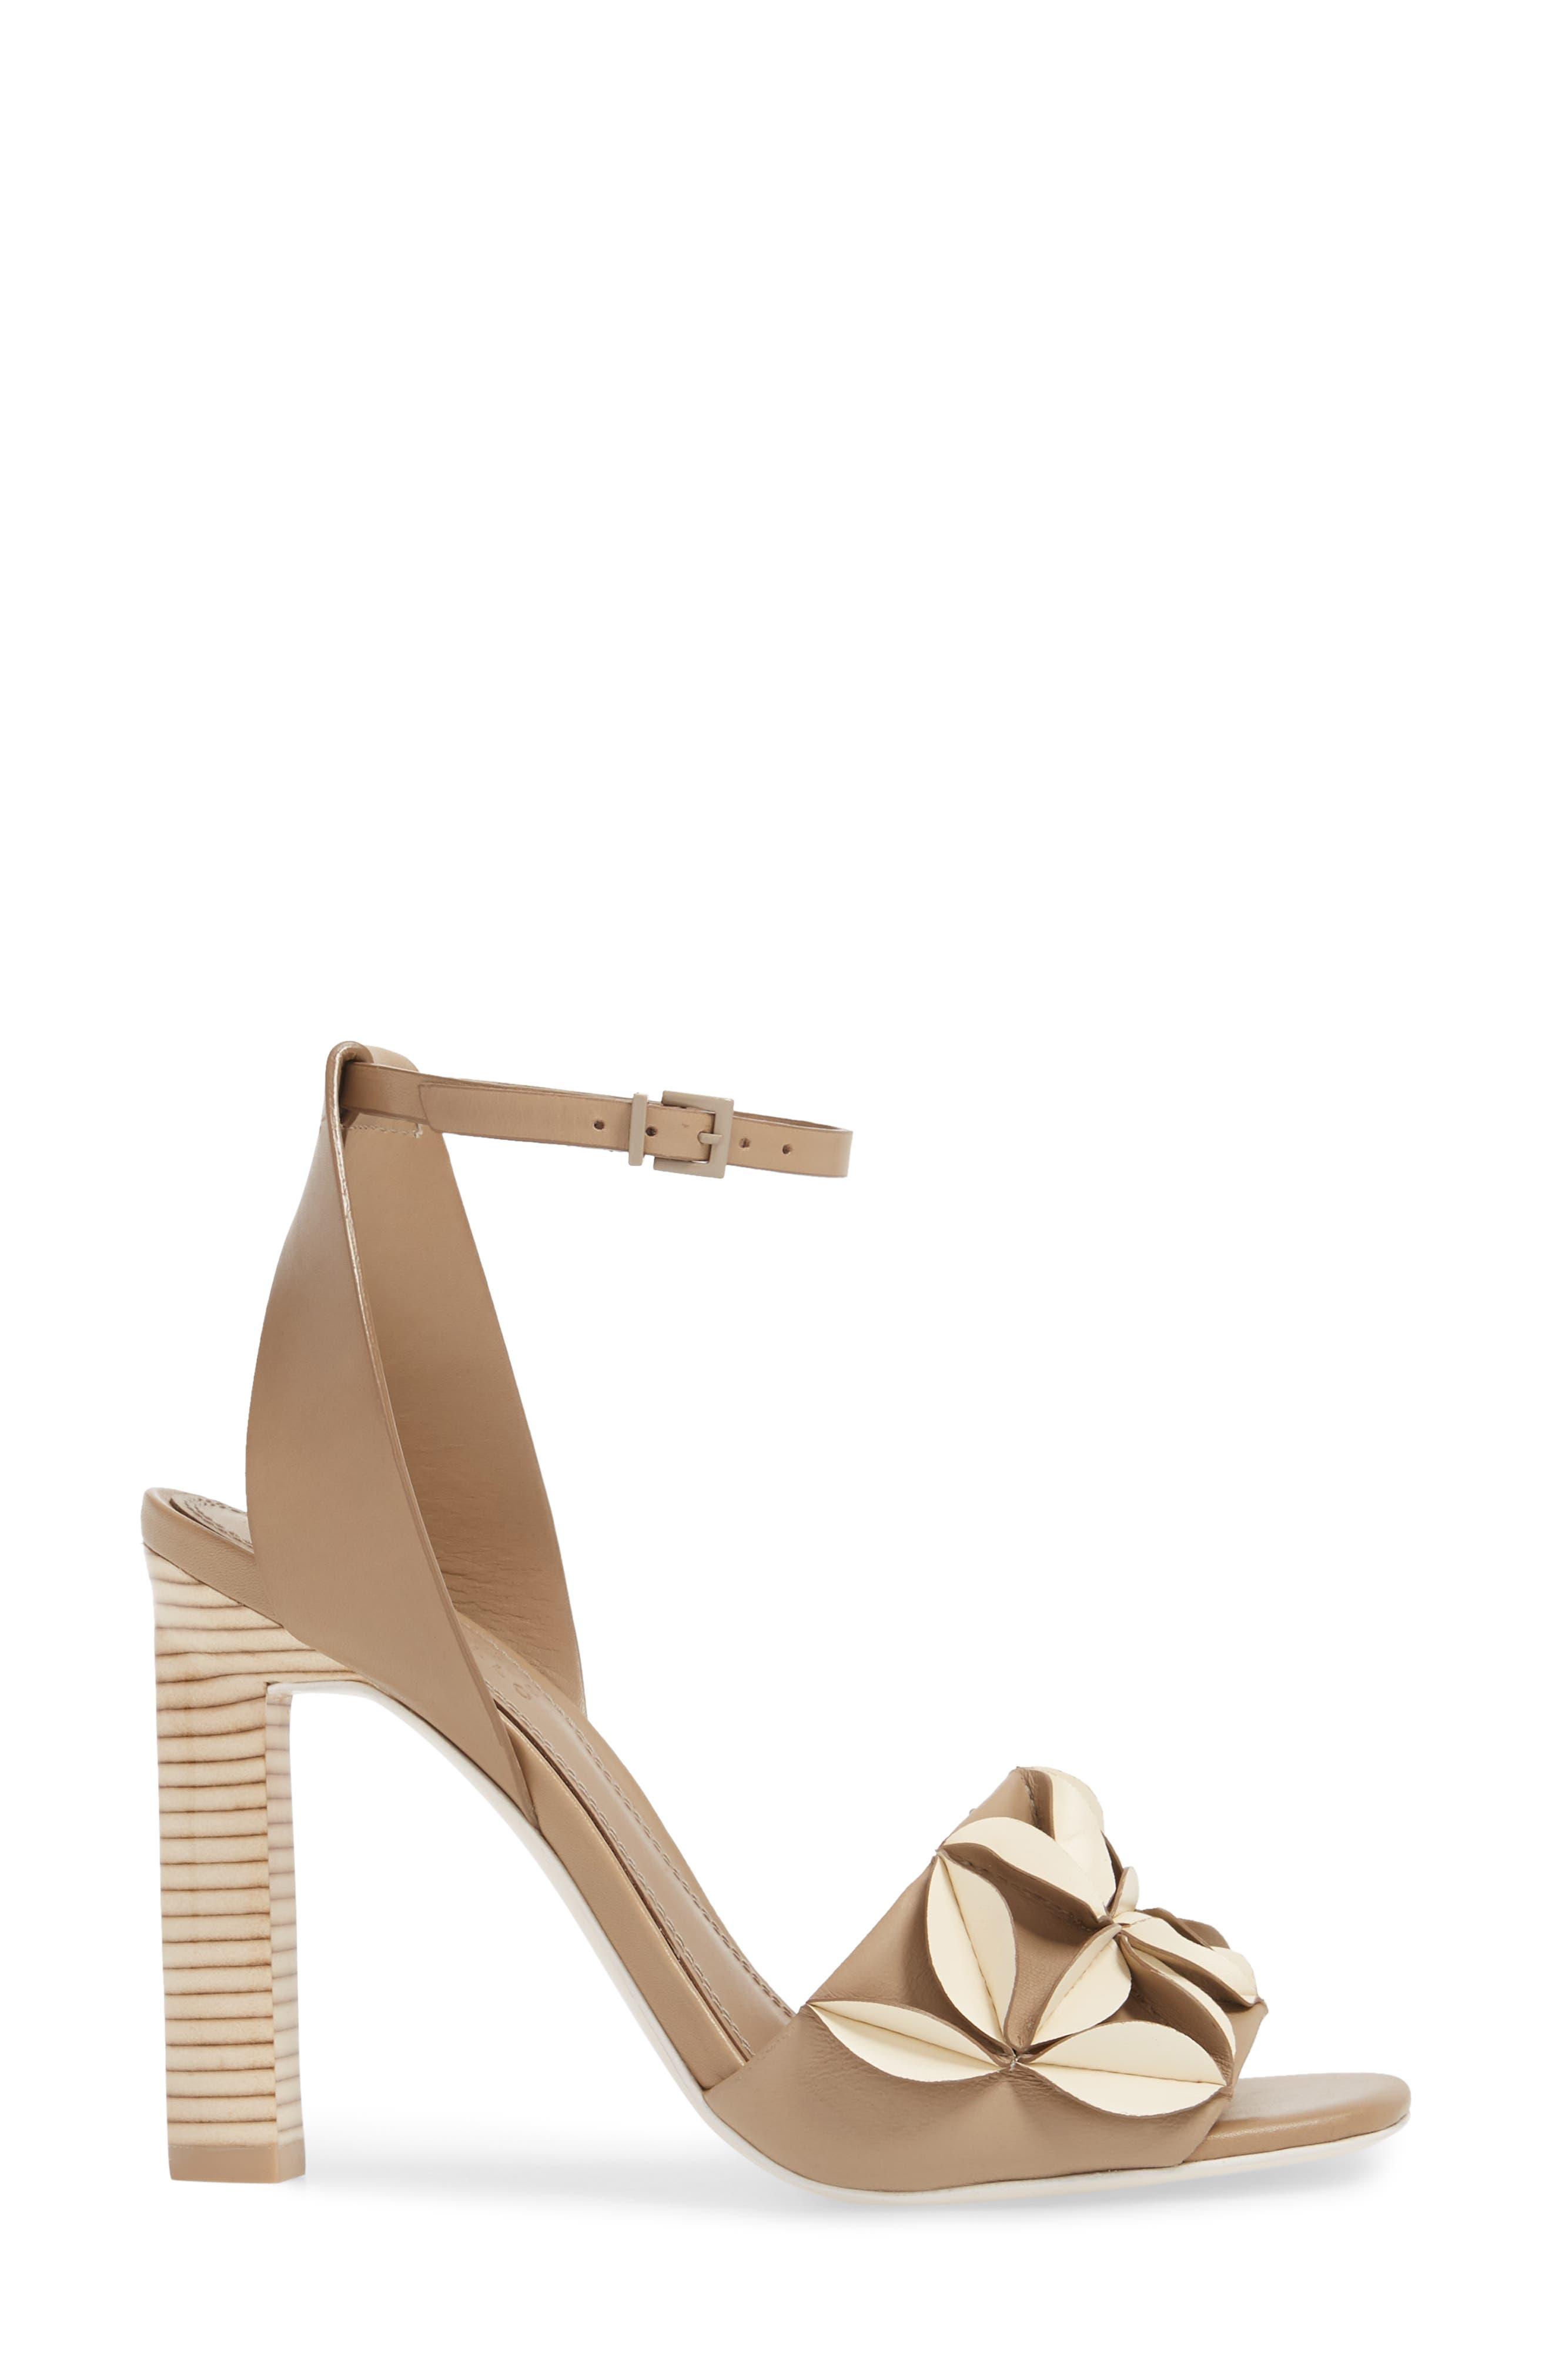 Milee Ankle Strap Sandal,                             Alternate thumbnail 3, color,                             250